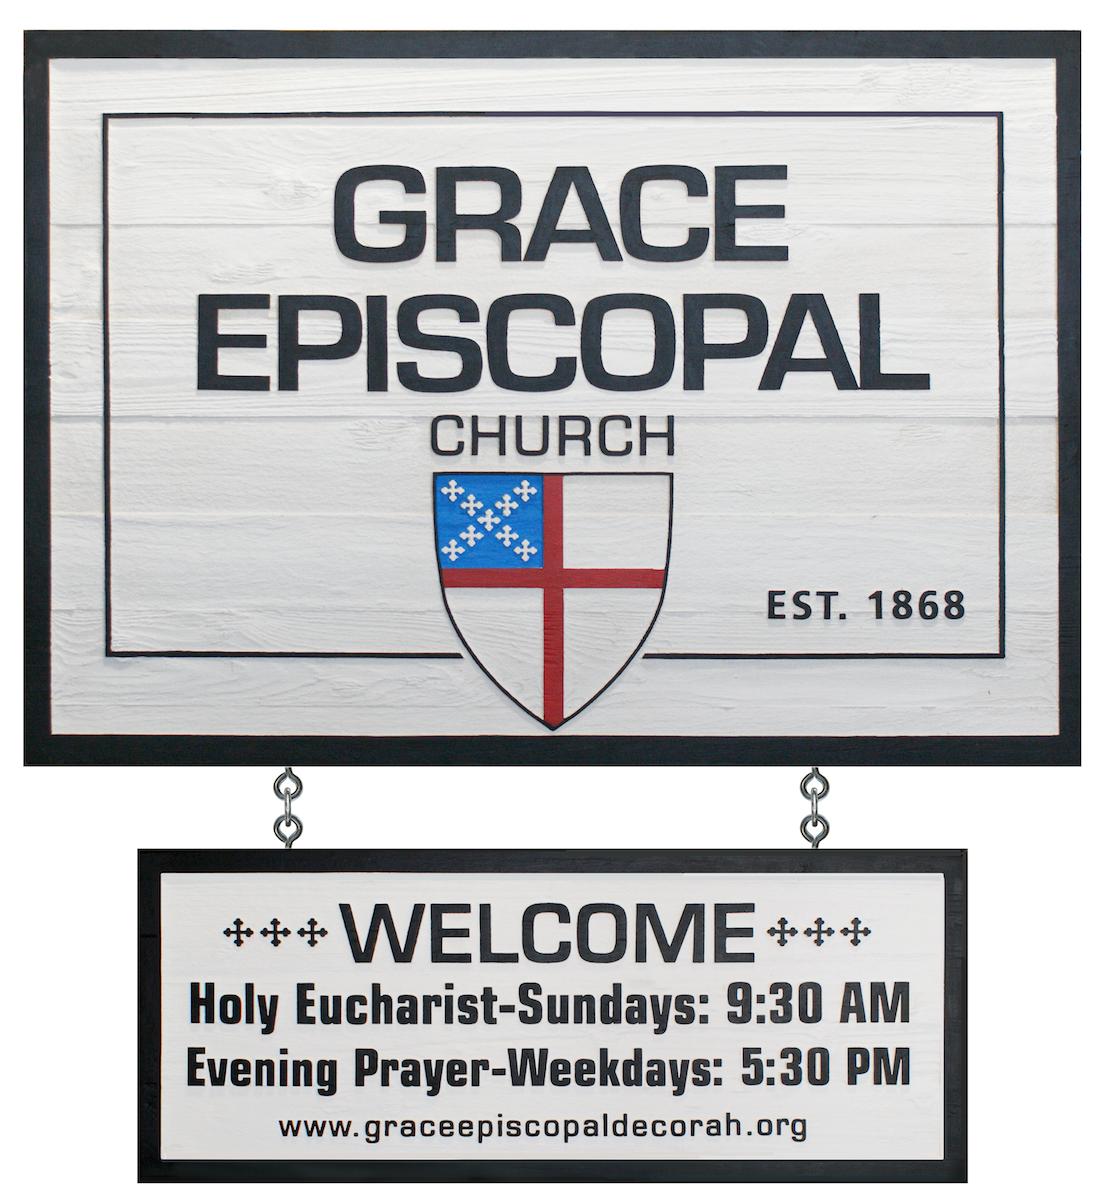 episcopal church sign by strata sandblasted wood signs www